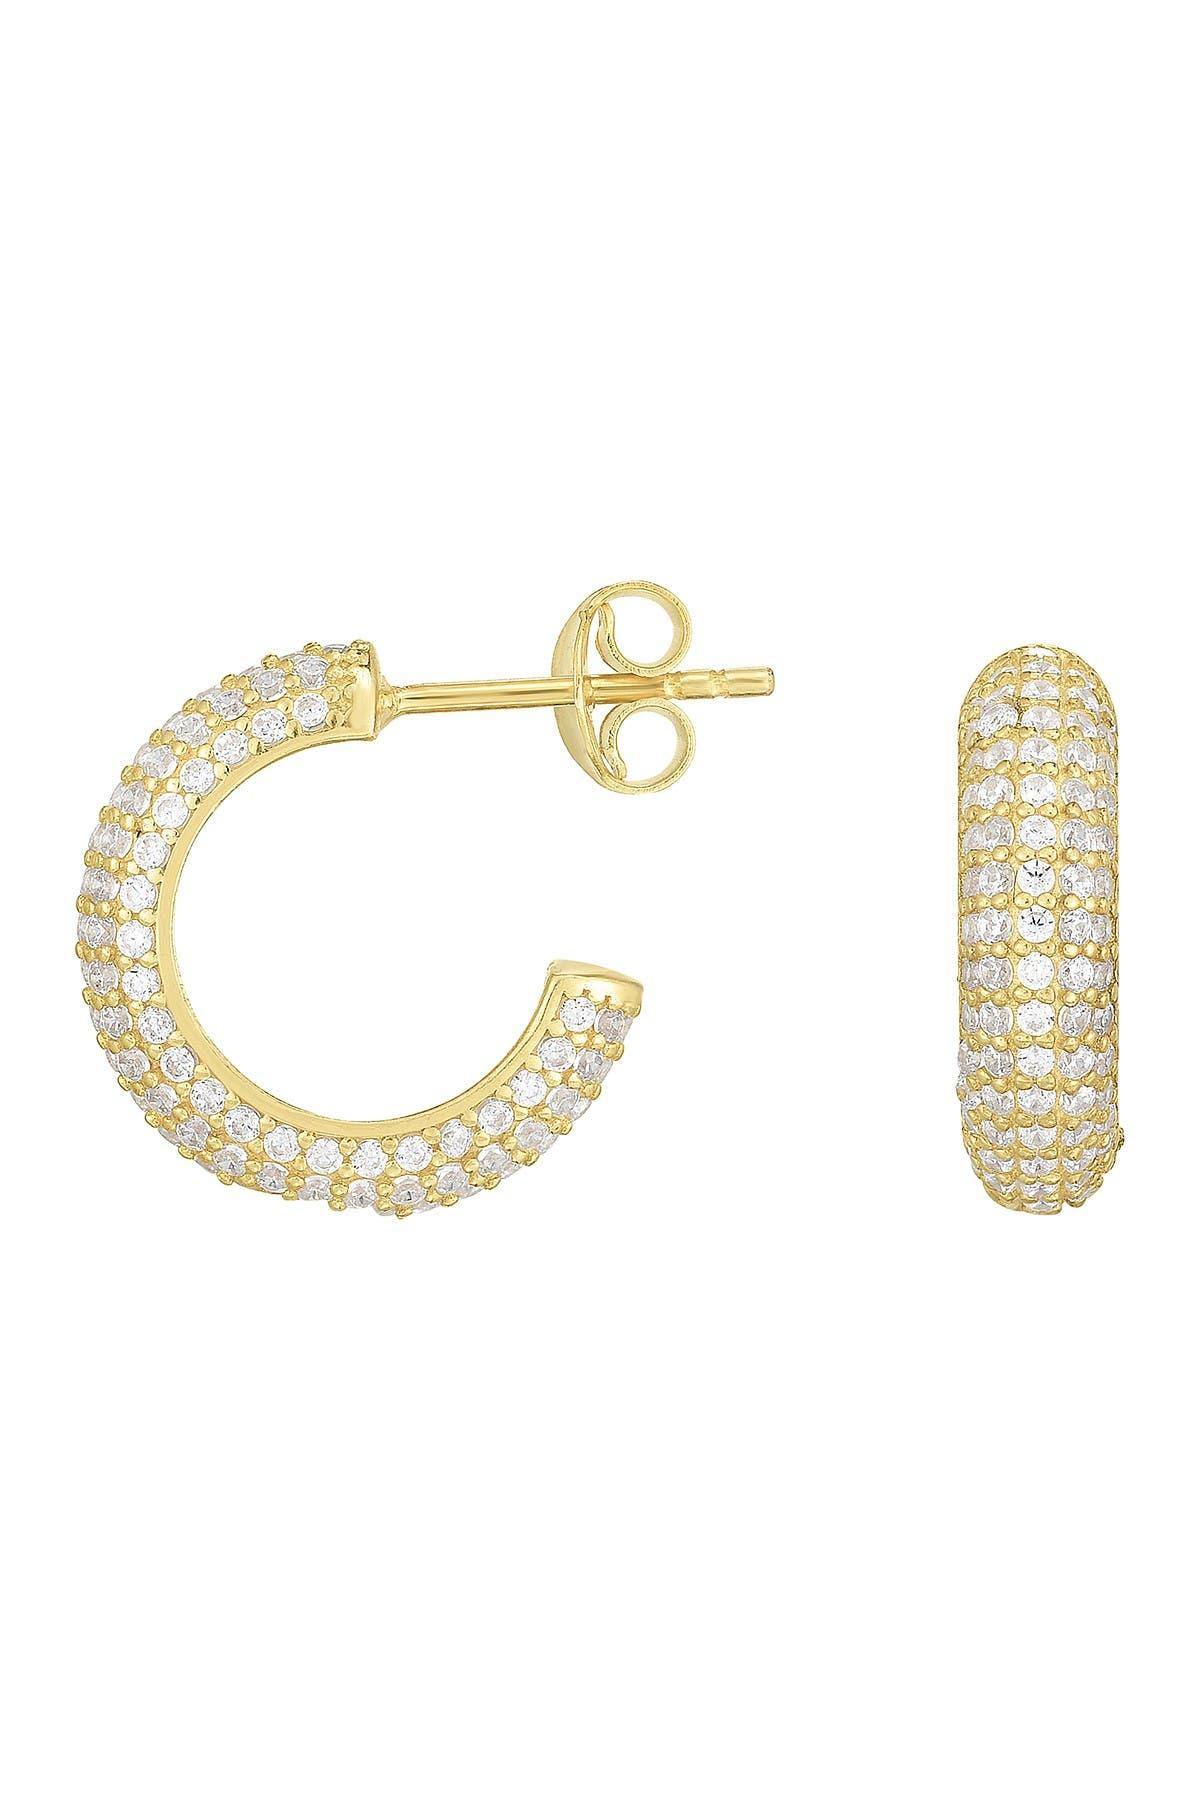 Sphera Milano 14K Yellow Gold Plated Sterling Silver Pave CZ 12mm Huggie Hoop Earrings at Nordstrom Rack